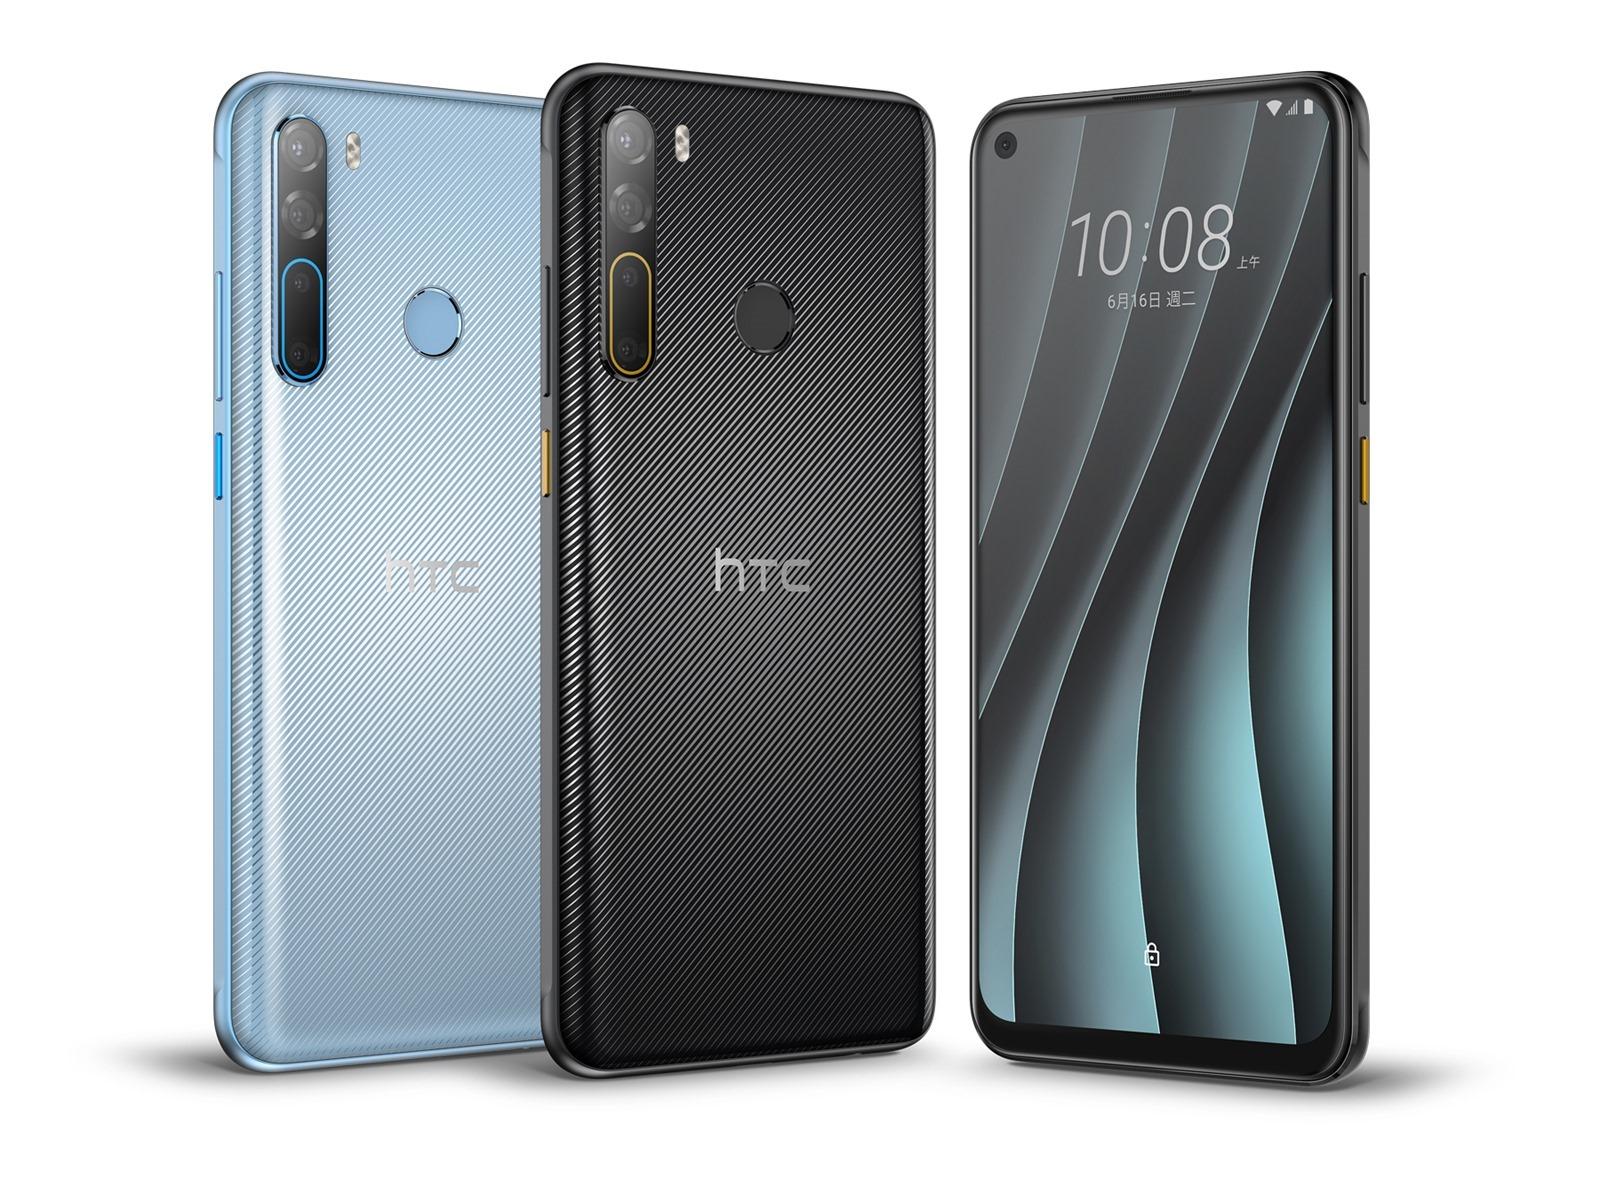 HTC 發表台灣首款 5G 智慧手機 HTC U20 5G,採用高通 S765G 處理器;還有 HTC Desire 20 pro (規格 / 上市 / 售價) @3C 達人廖阿輝